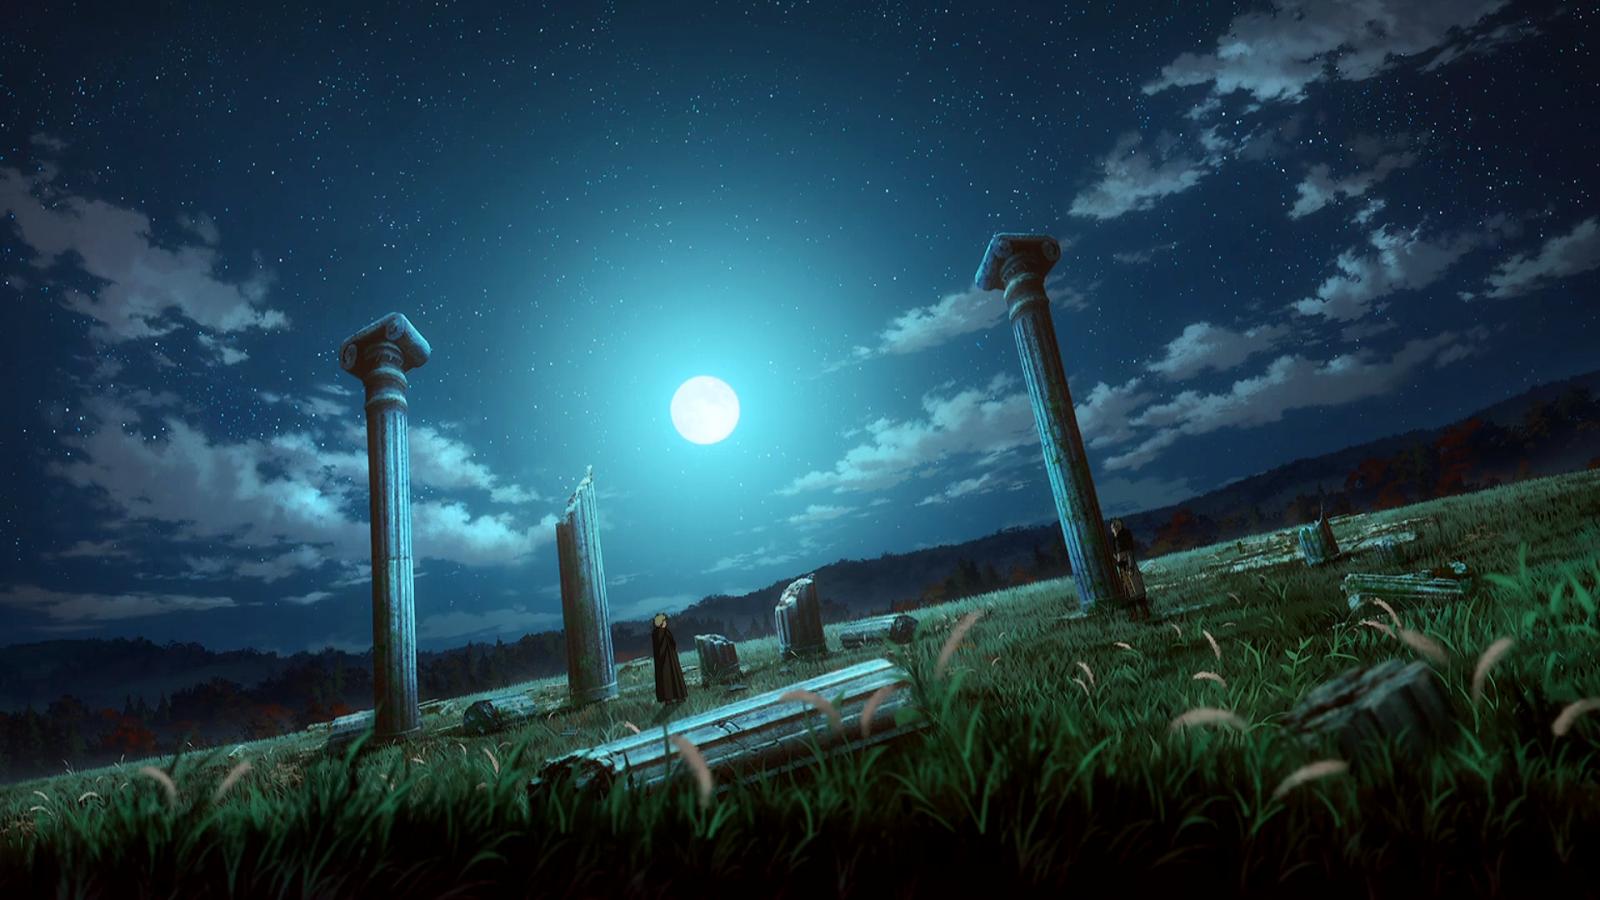 Wallpaper : Vinland Saga, landscape, ruins, night sky ...